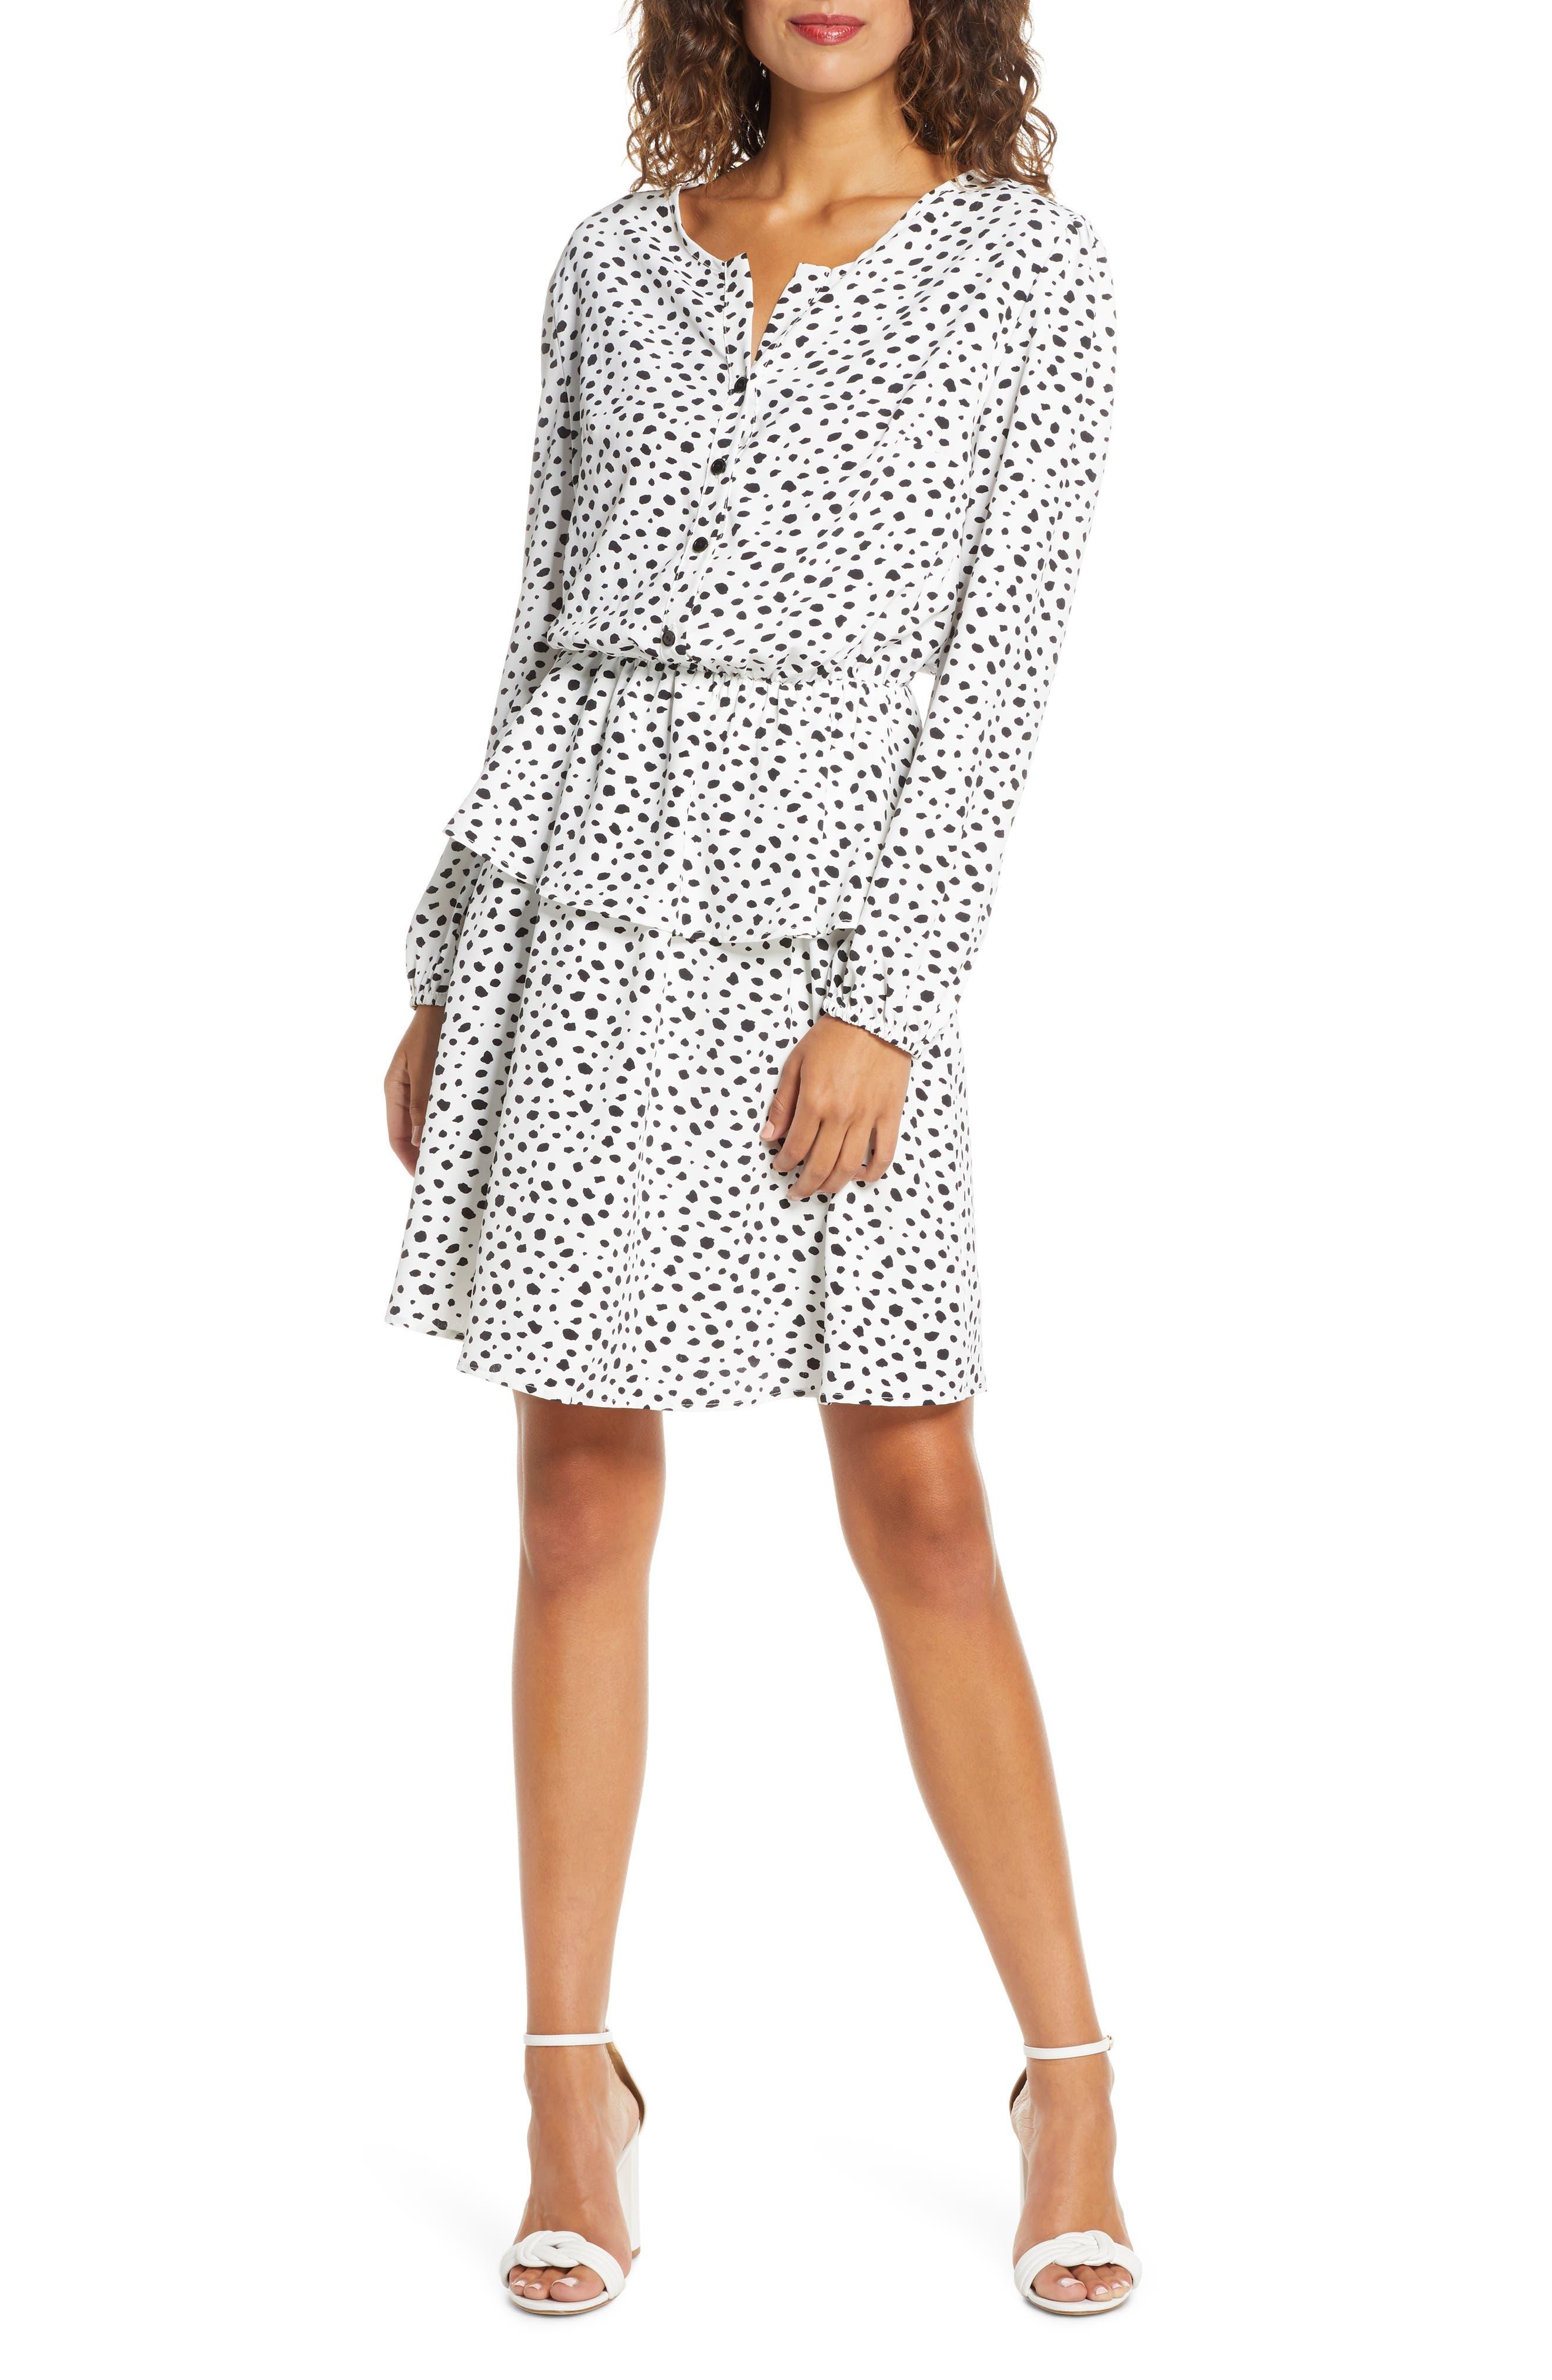 Image of Fraiche By J Dori Printed Tiered Dress